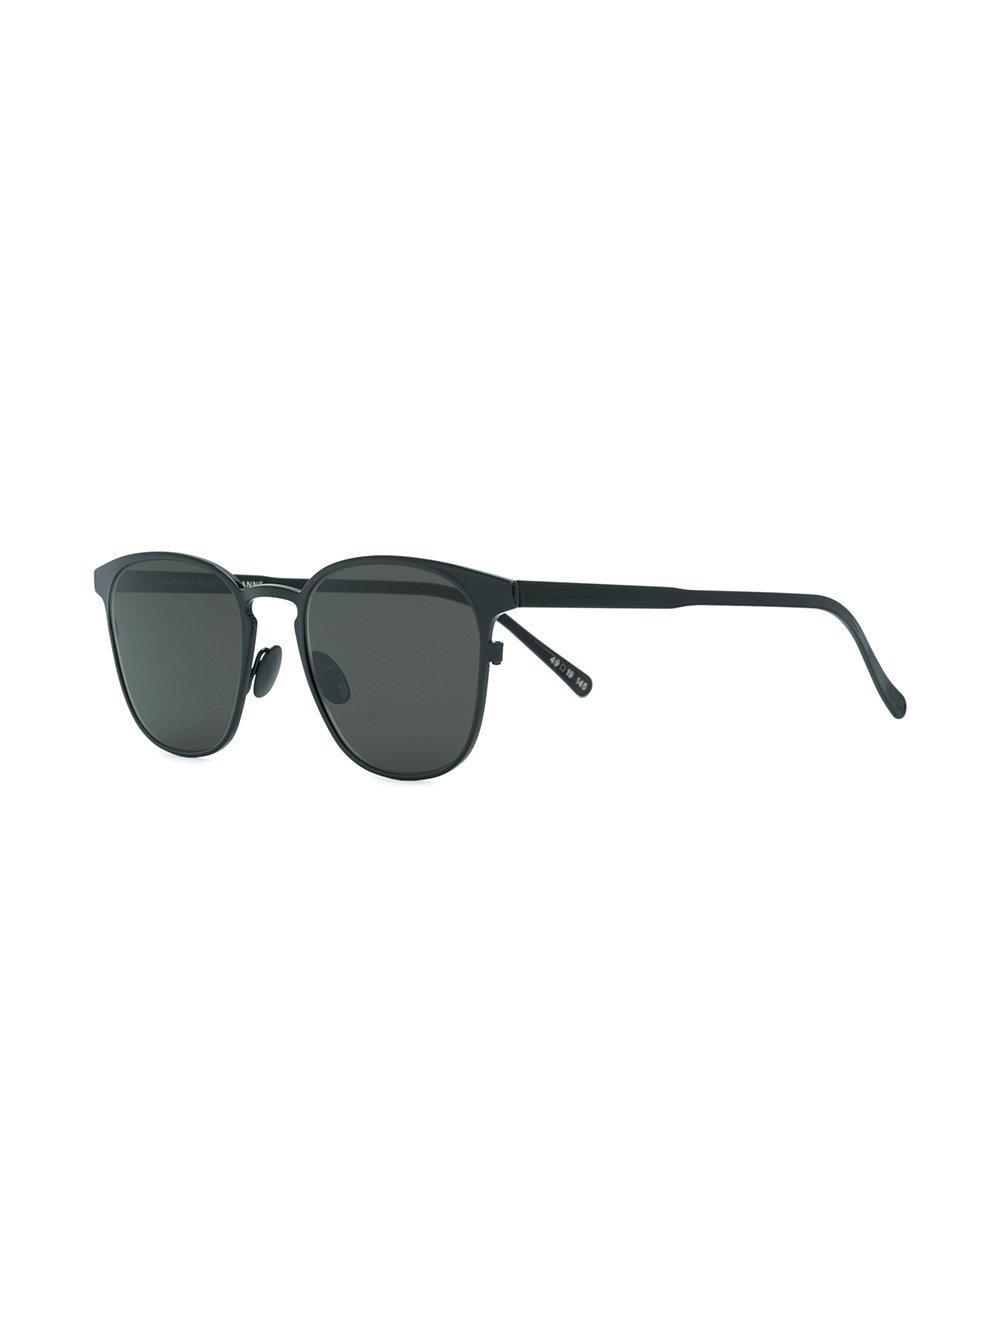 1e097ba1167 Paco Rabanne Square Shape Sunglasses in Black - Lyst